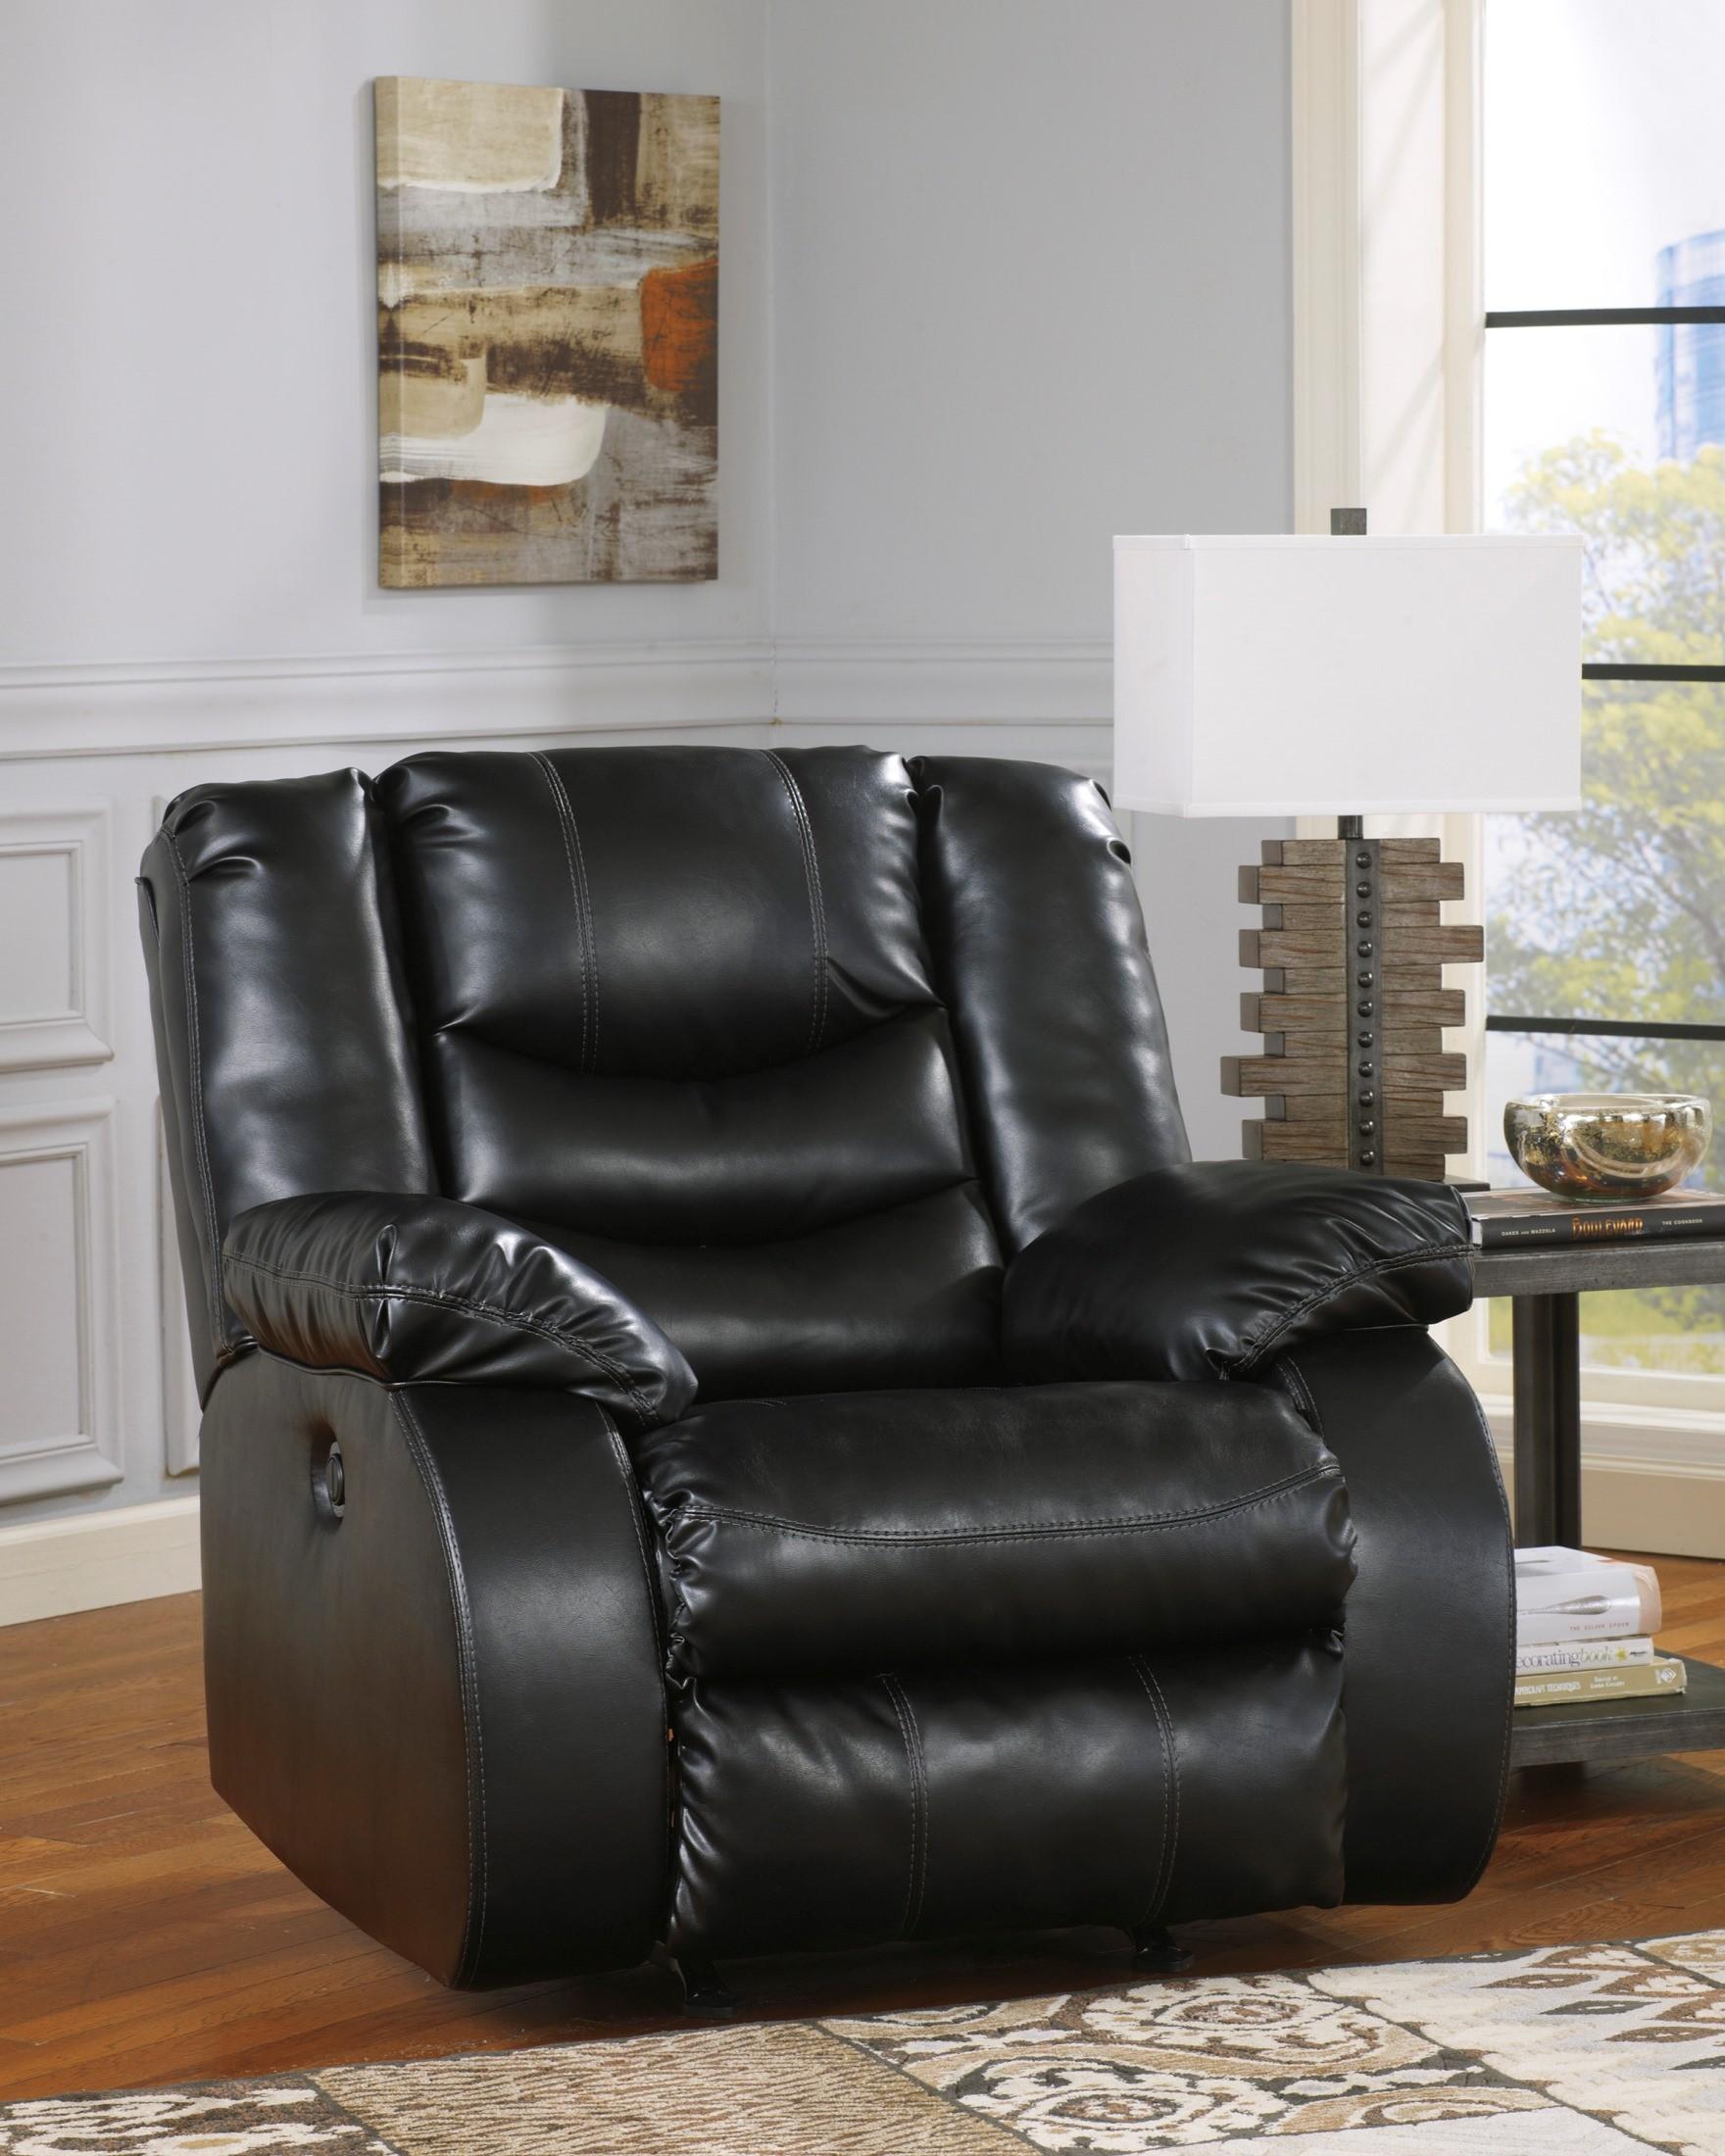 LineBacker DuraBlend Black Rocker Recliner From Ashley (9520225) | Coleman  Furniture